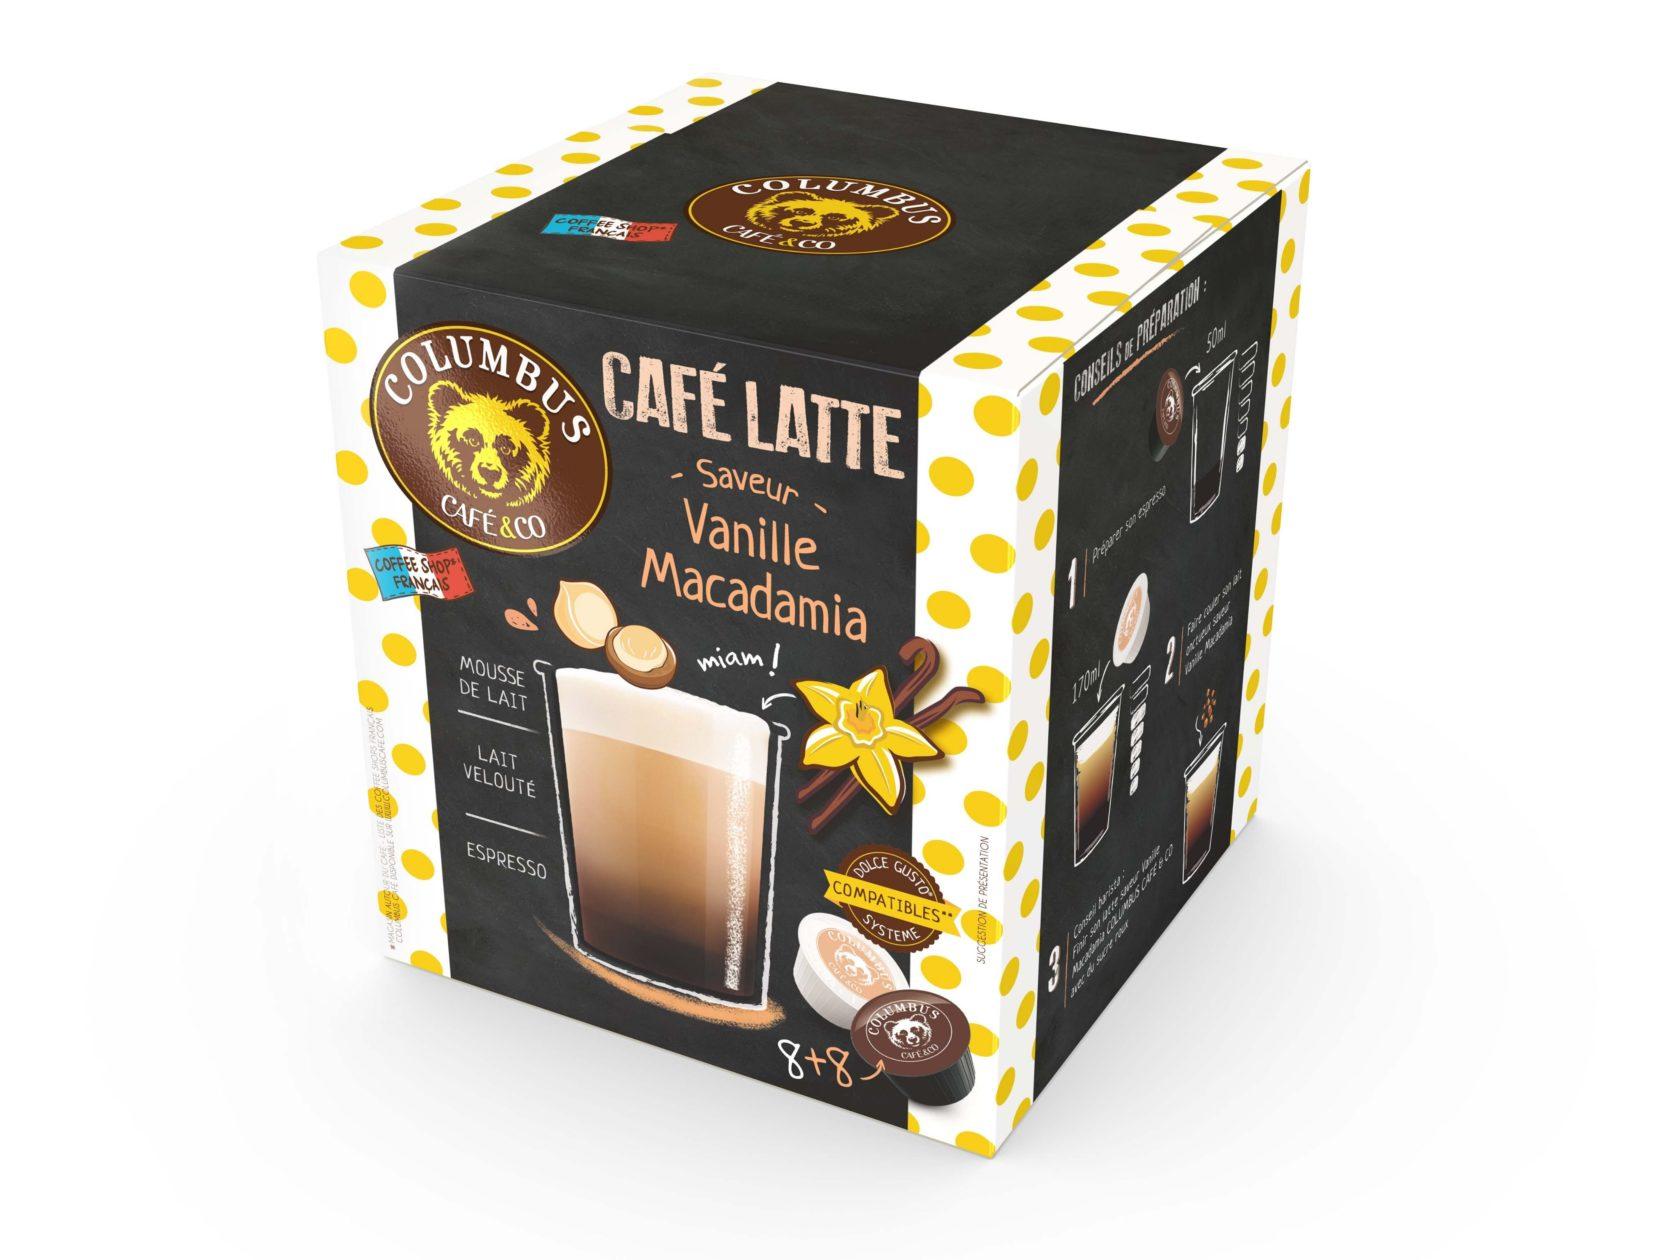 Le Café Latte saveur Vanille Macadamia Dolce Gusto® x 16